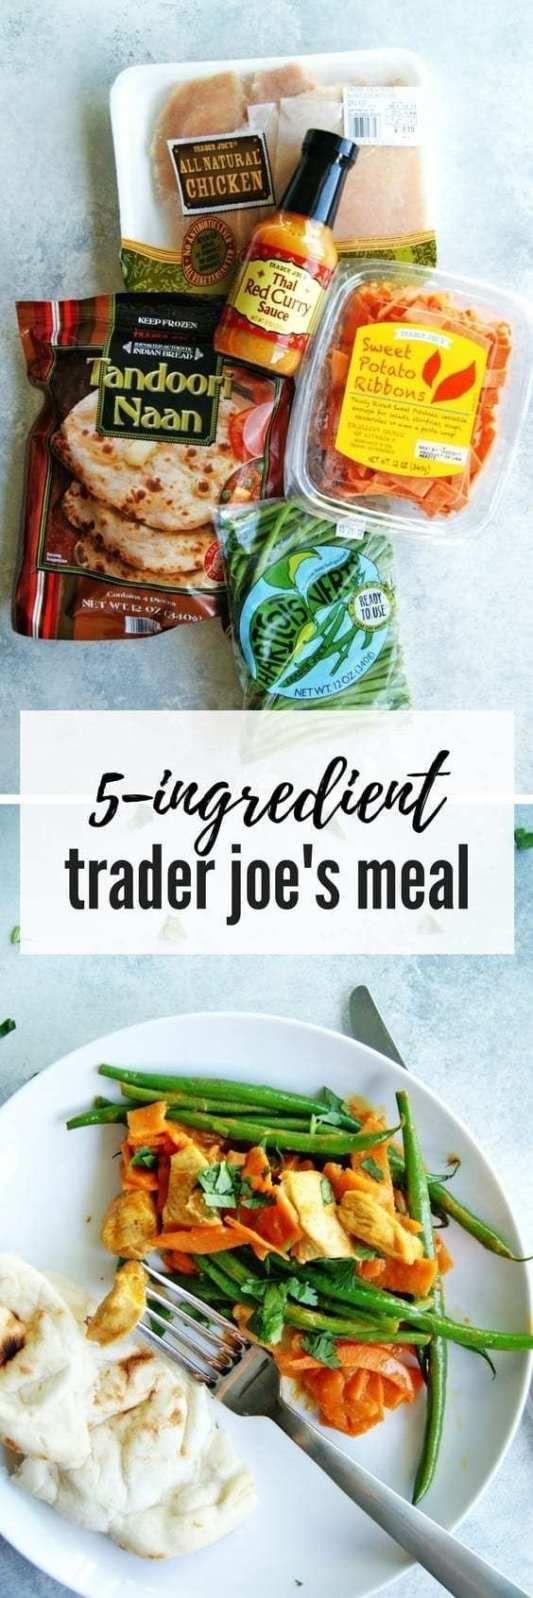 Easy Trader Joe's Recipe: Chicken & Vegetable Curry - My Everyday Table #quickdinnerideas